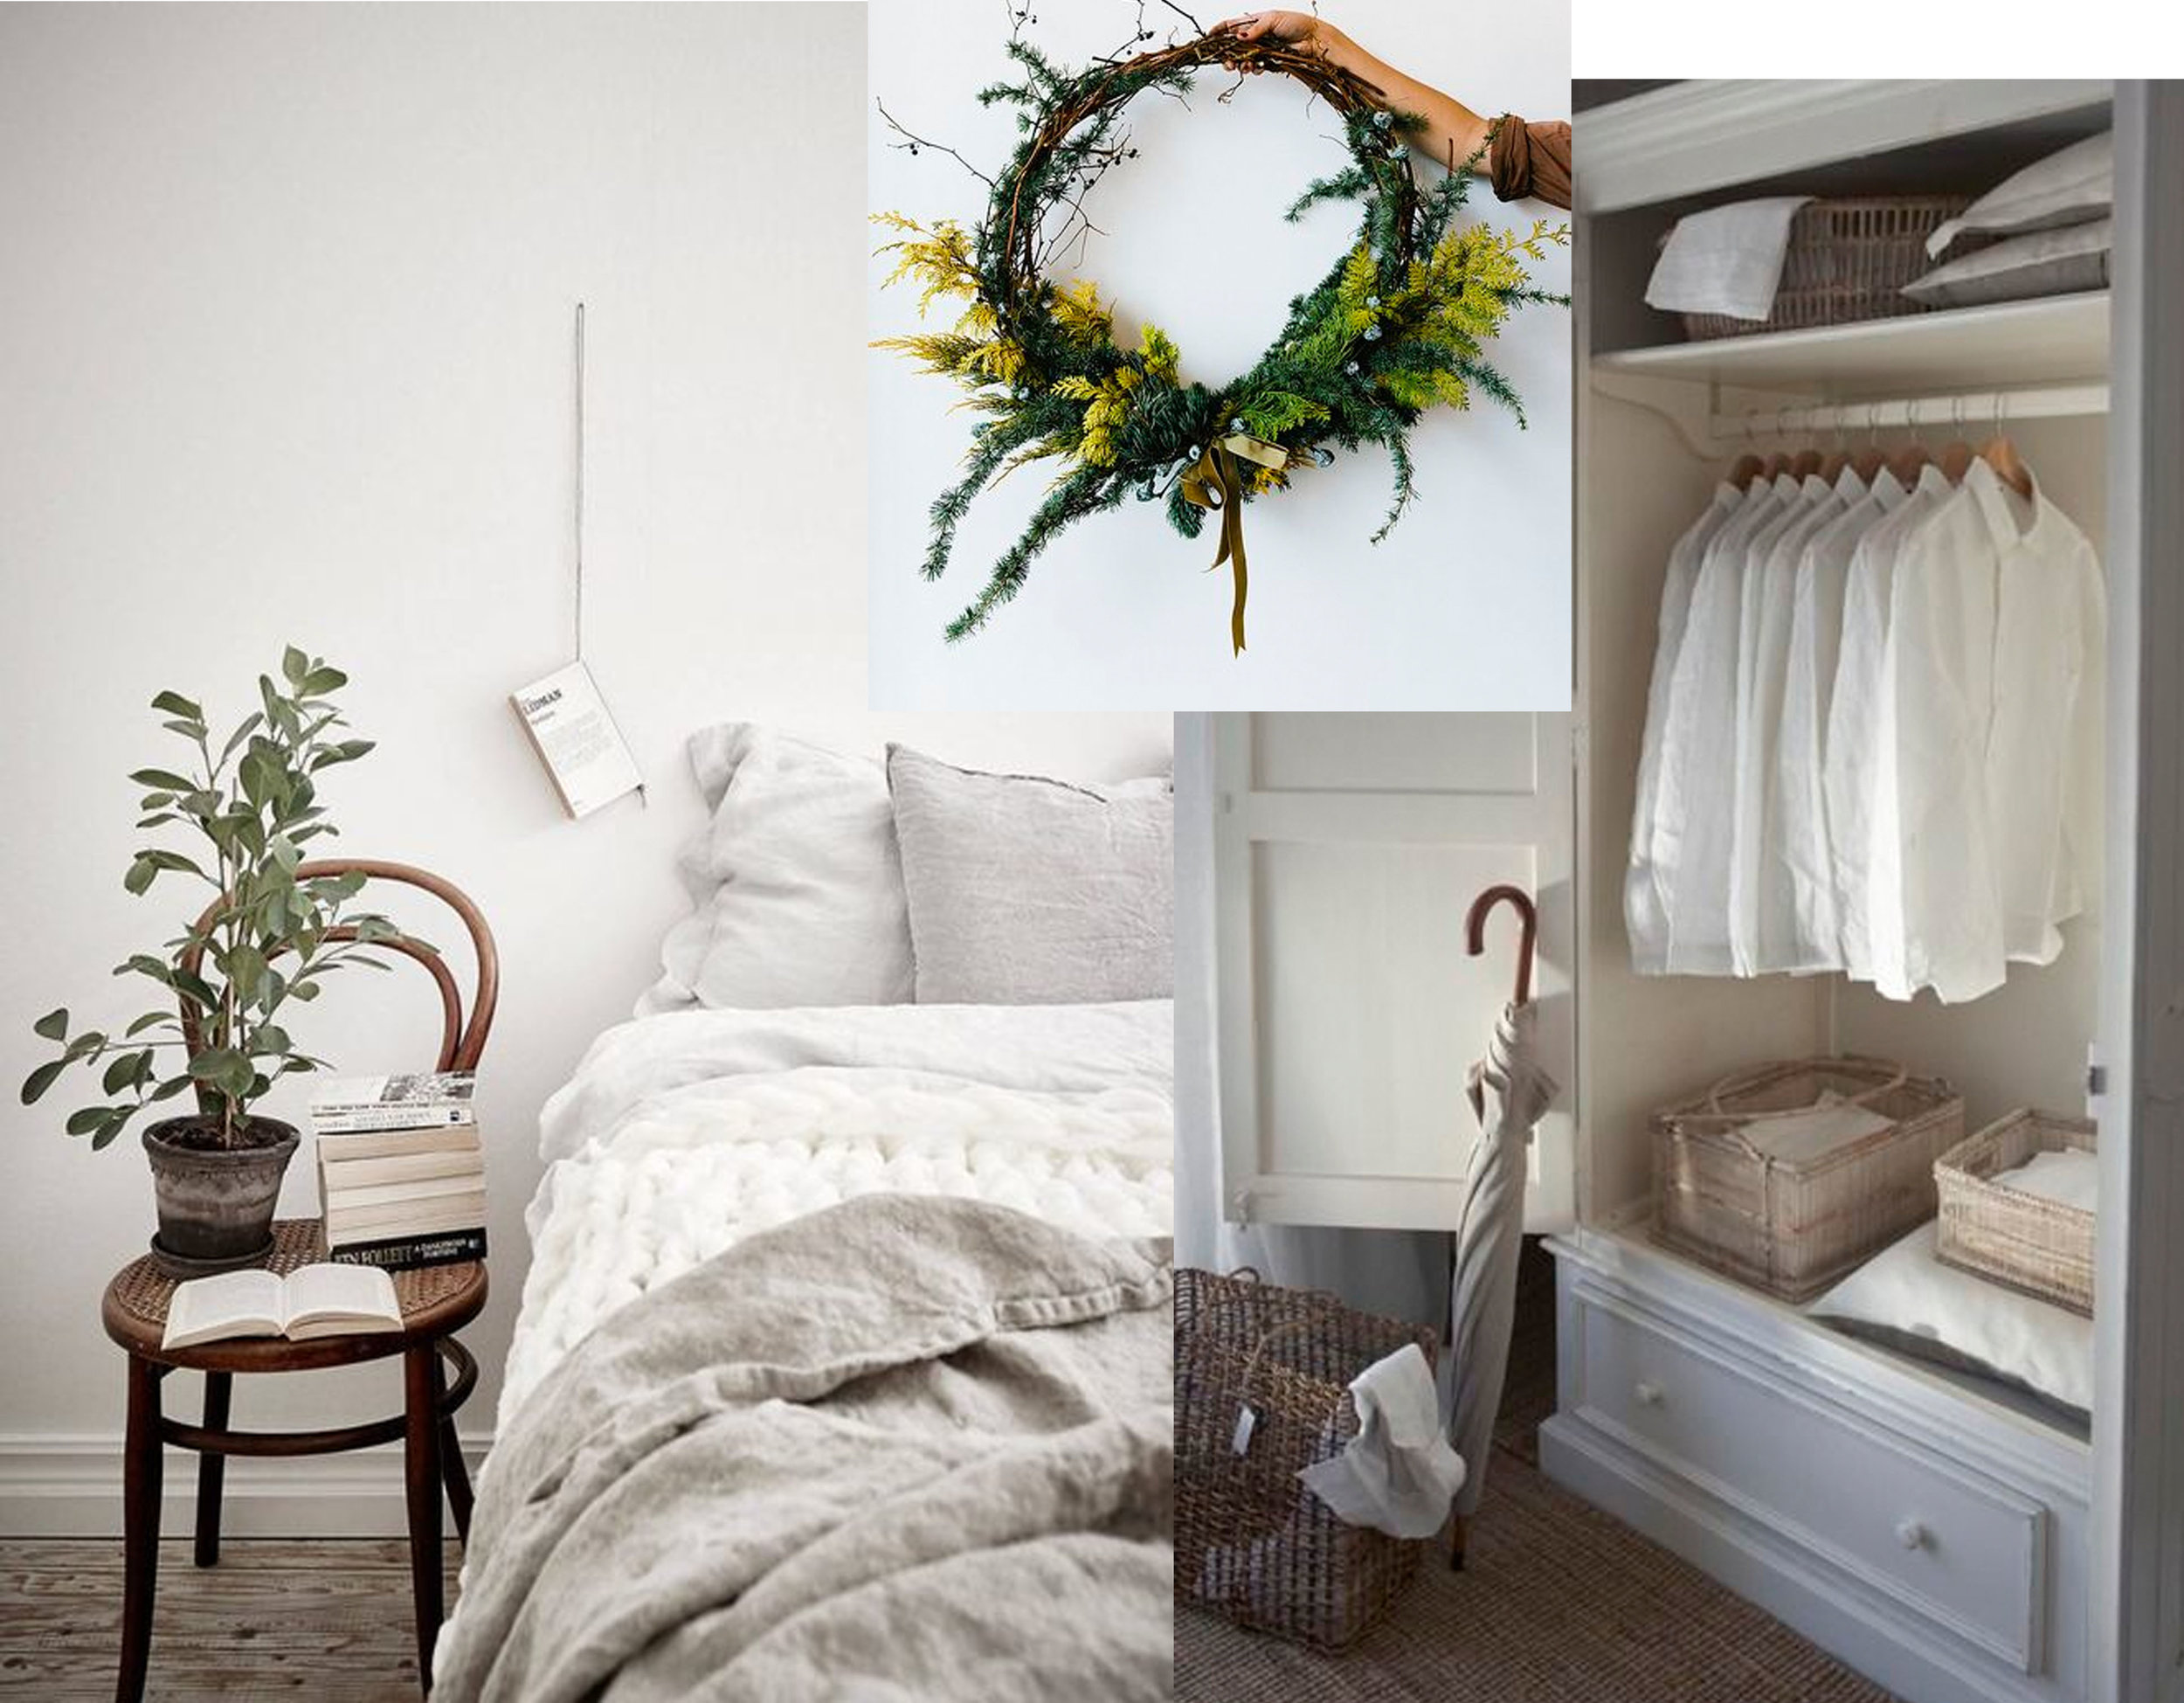 image via  Grey Deco  - Wreath via  Pinterest  - wardrobe via  Seaglass